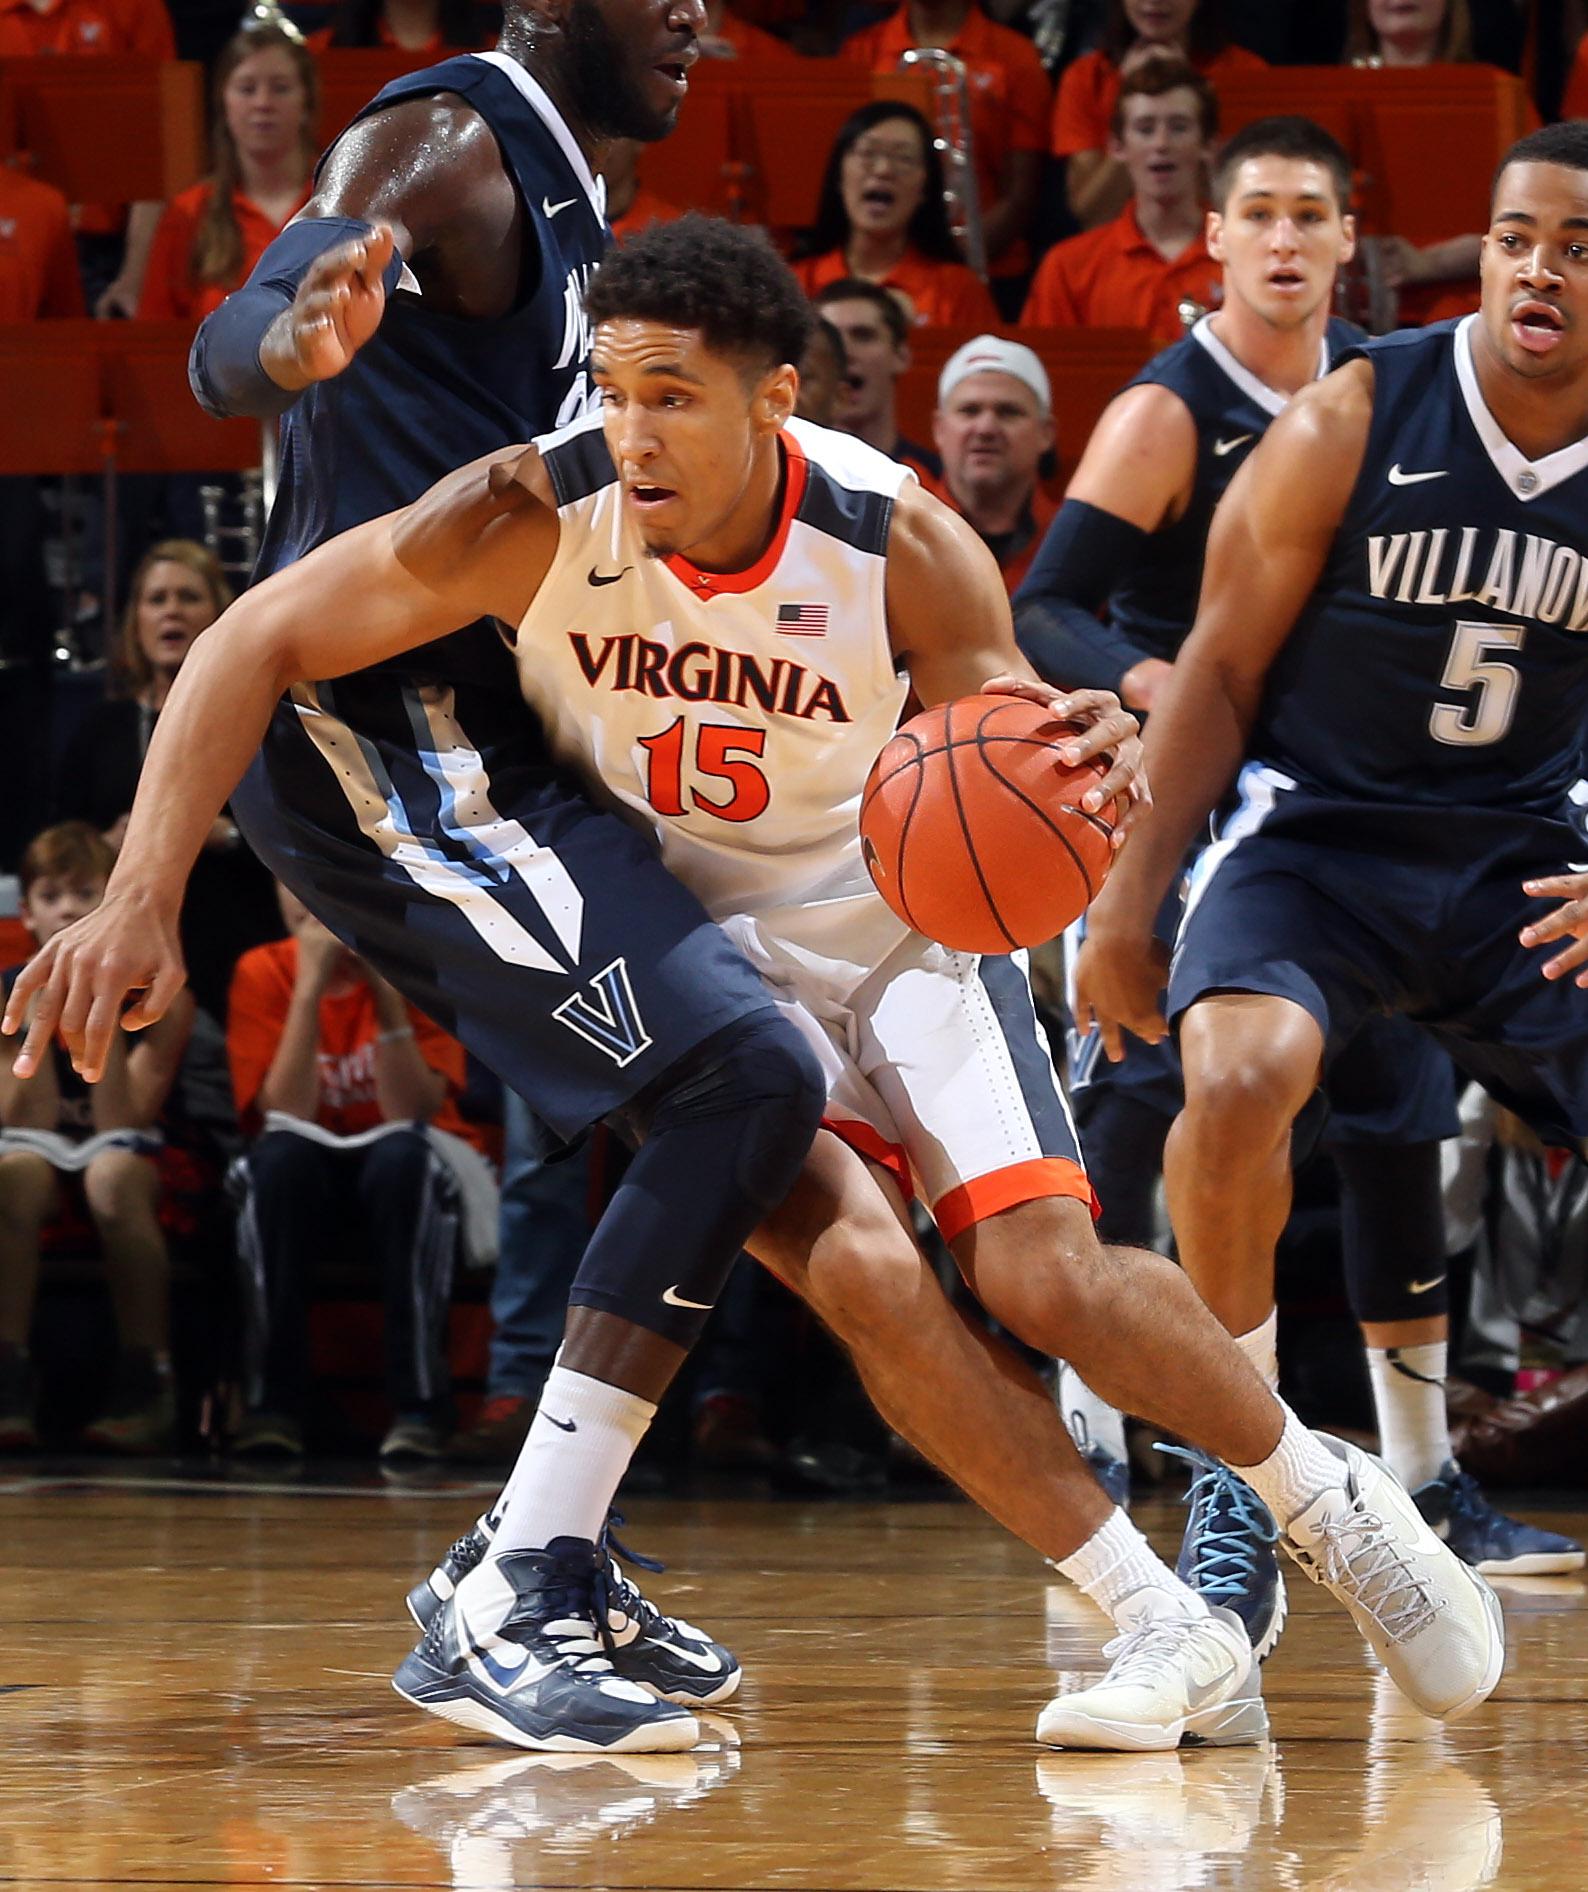 Virginia guard Malcolm Brogdon (15) runs into Villanova forward Daniel Ochefu (23) during an NCAA basketball game Saturday Dec. 19, 2015, in Charlottesville, Va. (AP Photo/Andrew Shurtleff)